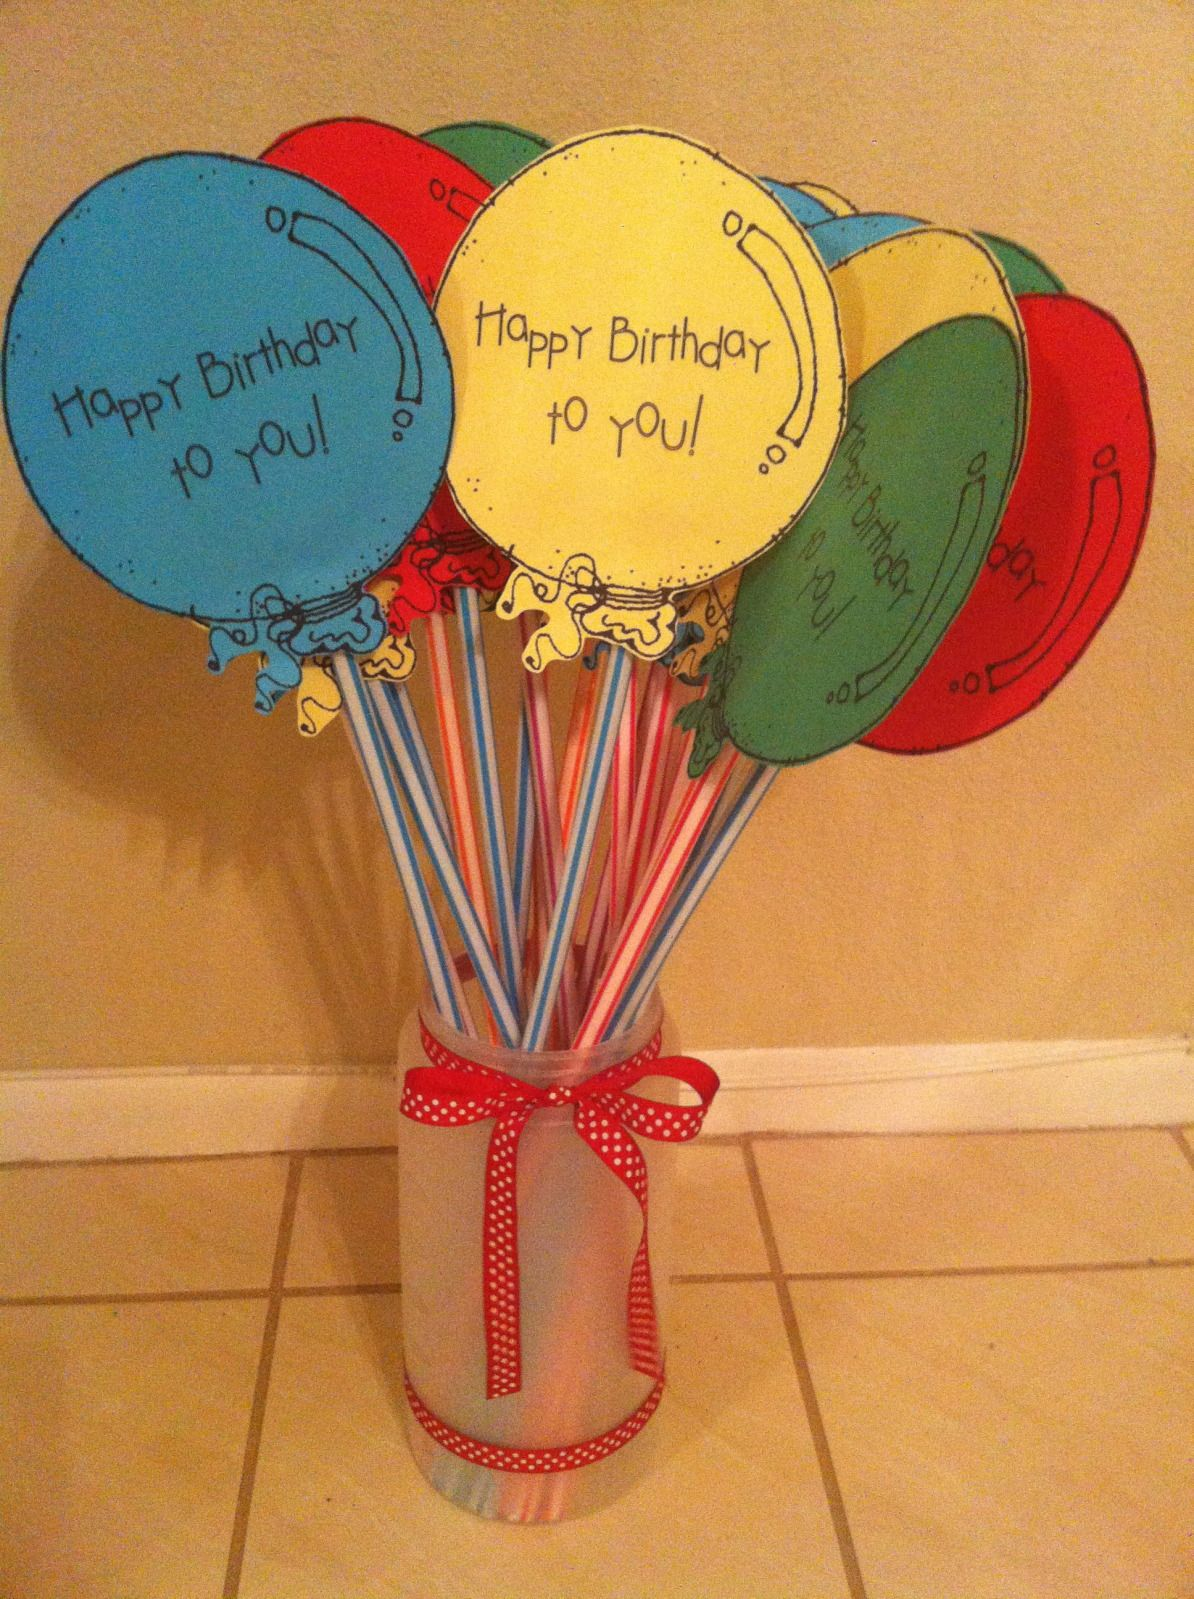 Pixie Stick balloons